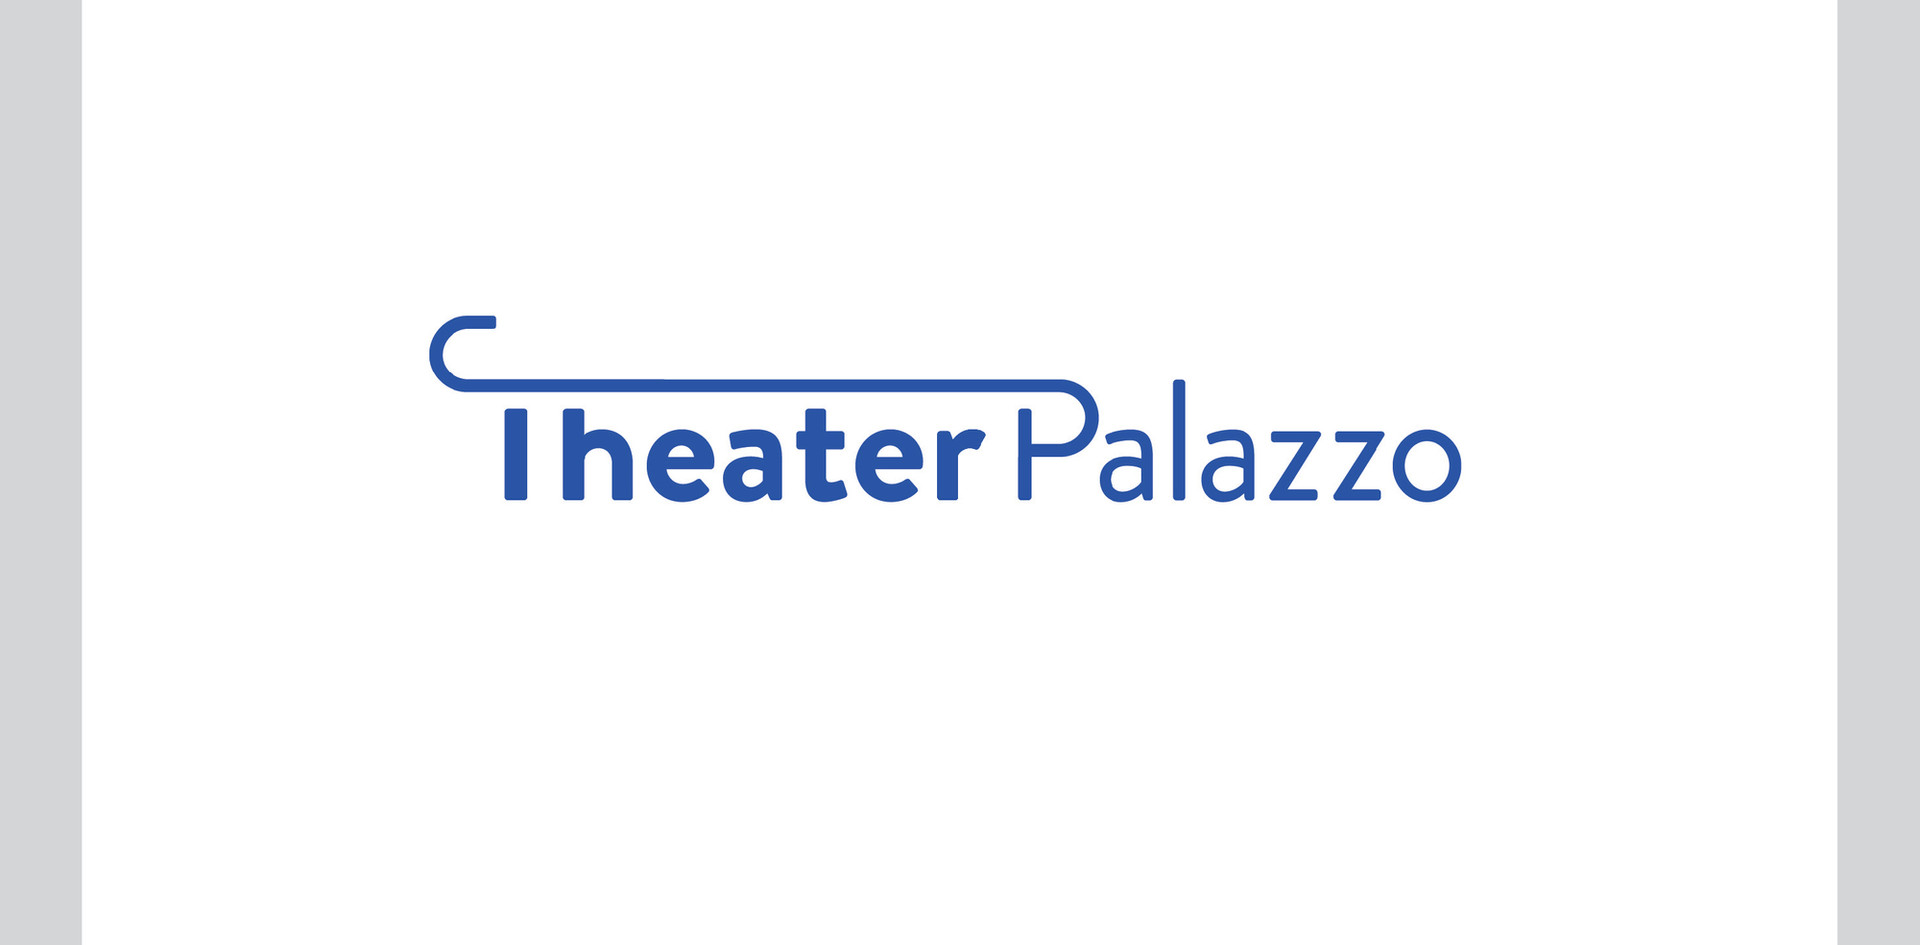 Theater Palazzo